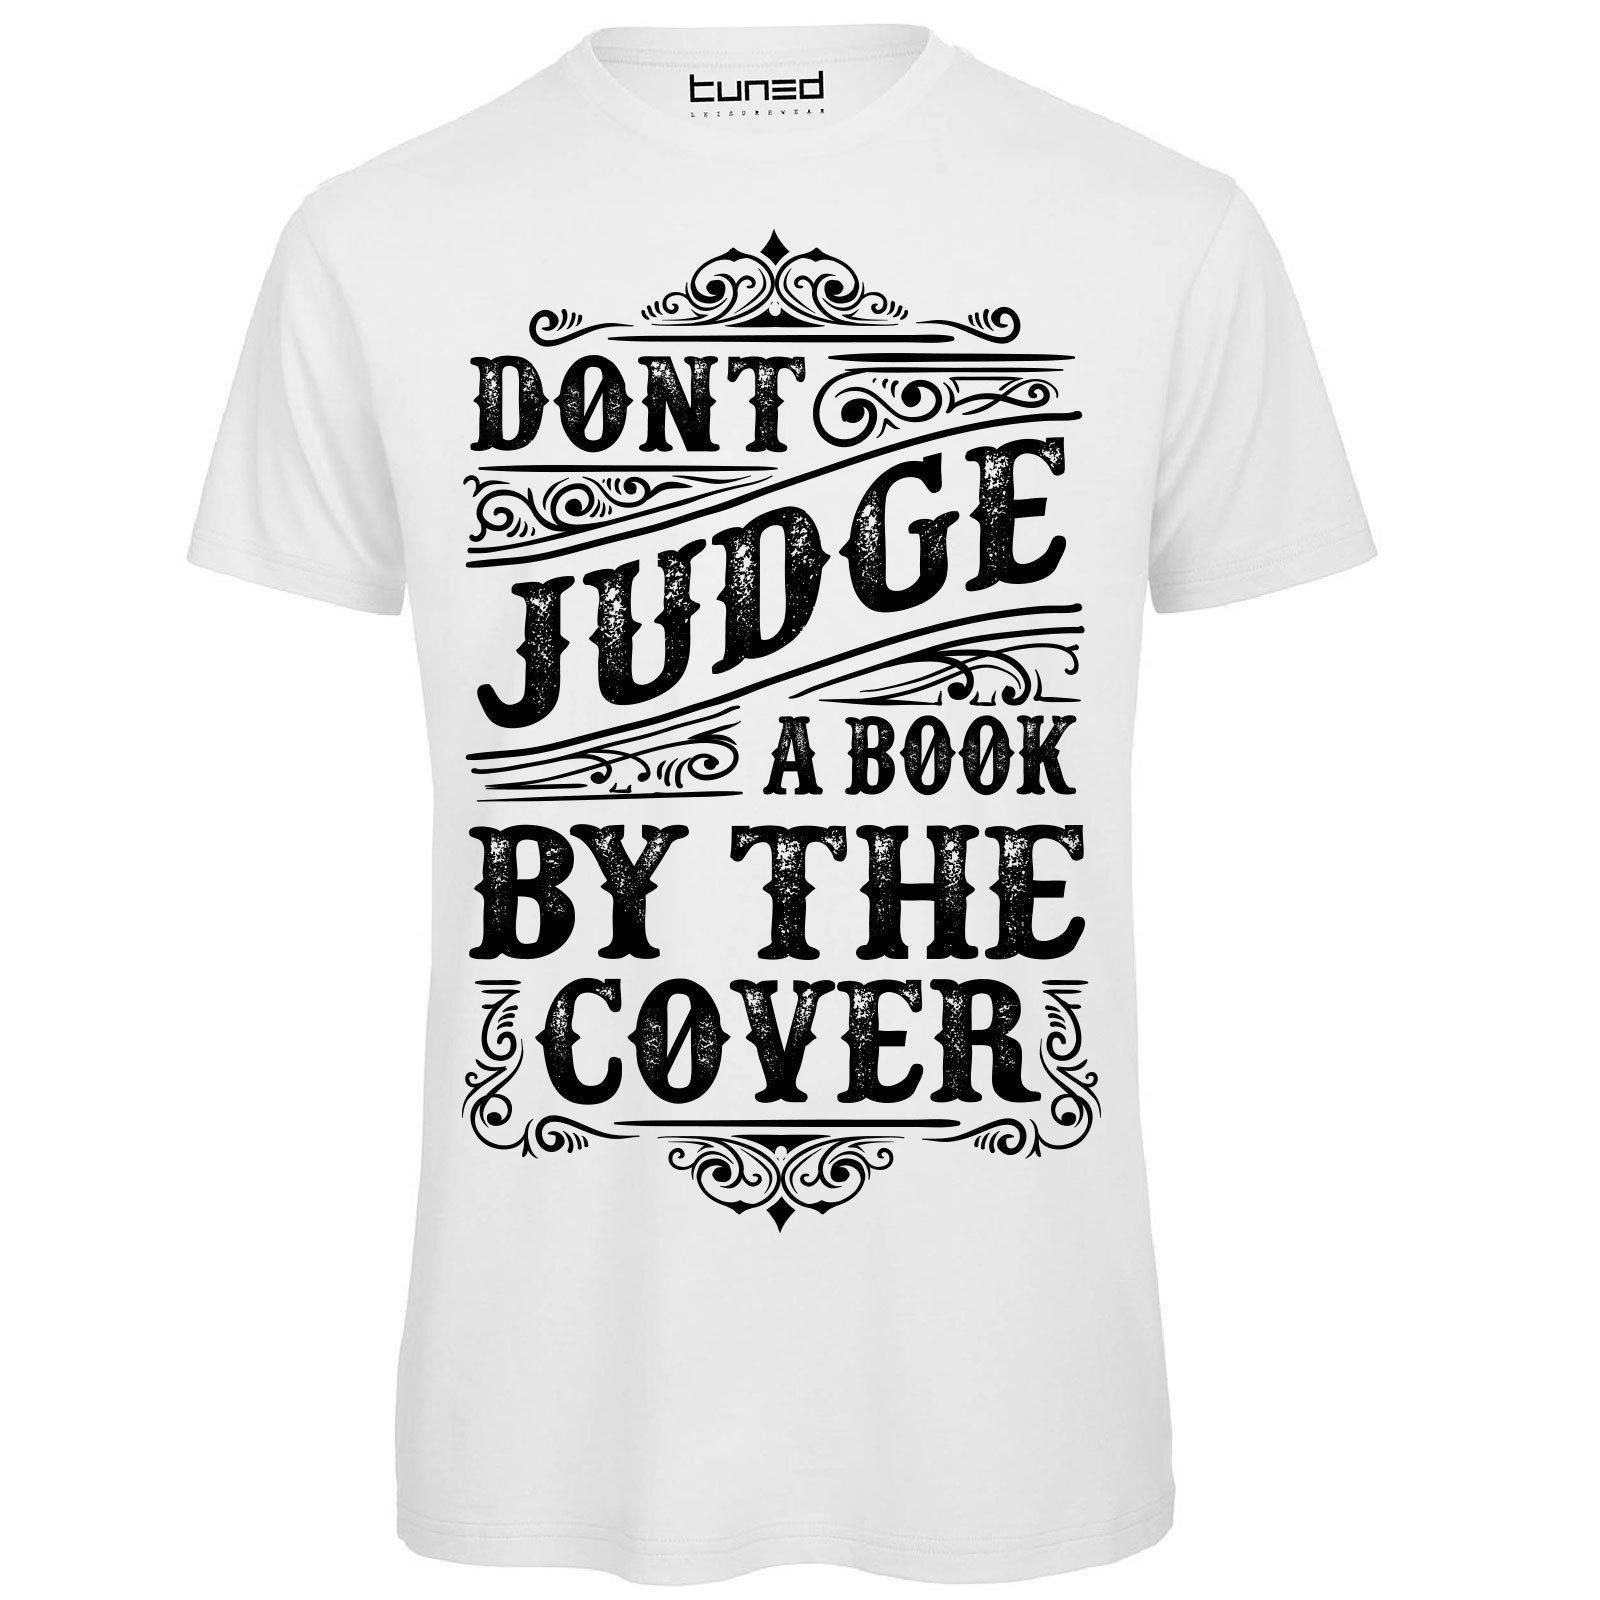 fd6d1f9bb6 T-shirt Divertente Uomo Maglia Con Stampa Frasi Ironiche Do not Judge Book  Tuned Fashion Logo Printing T Shirt